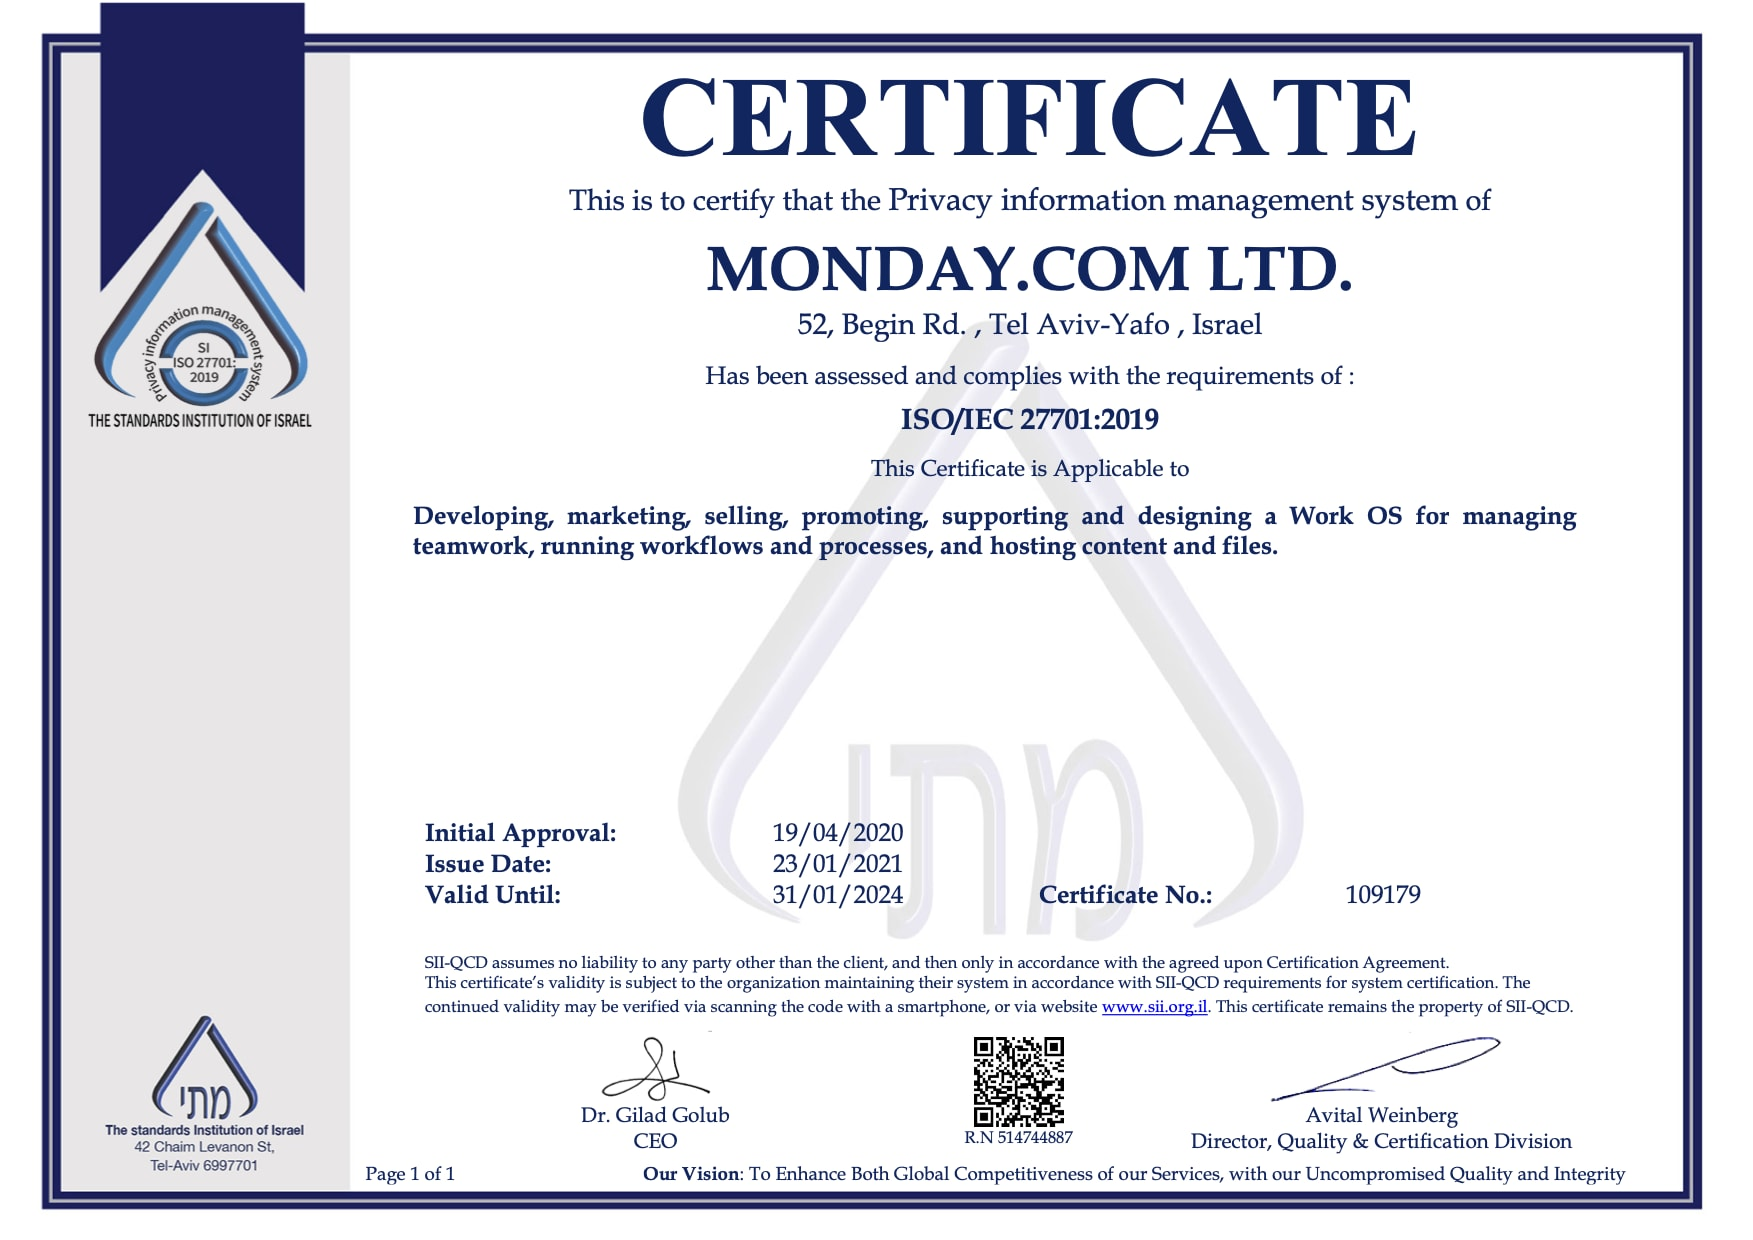 MONDAY.COM LTD. 27701